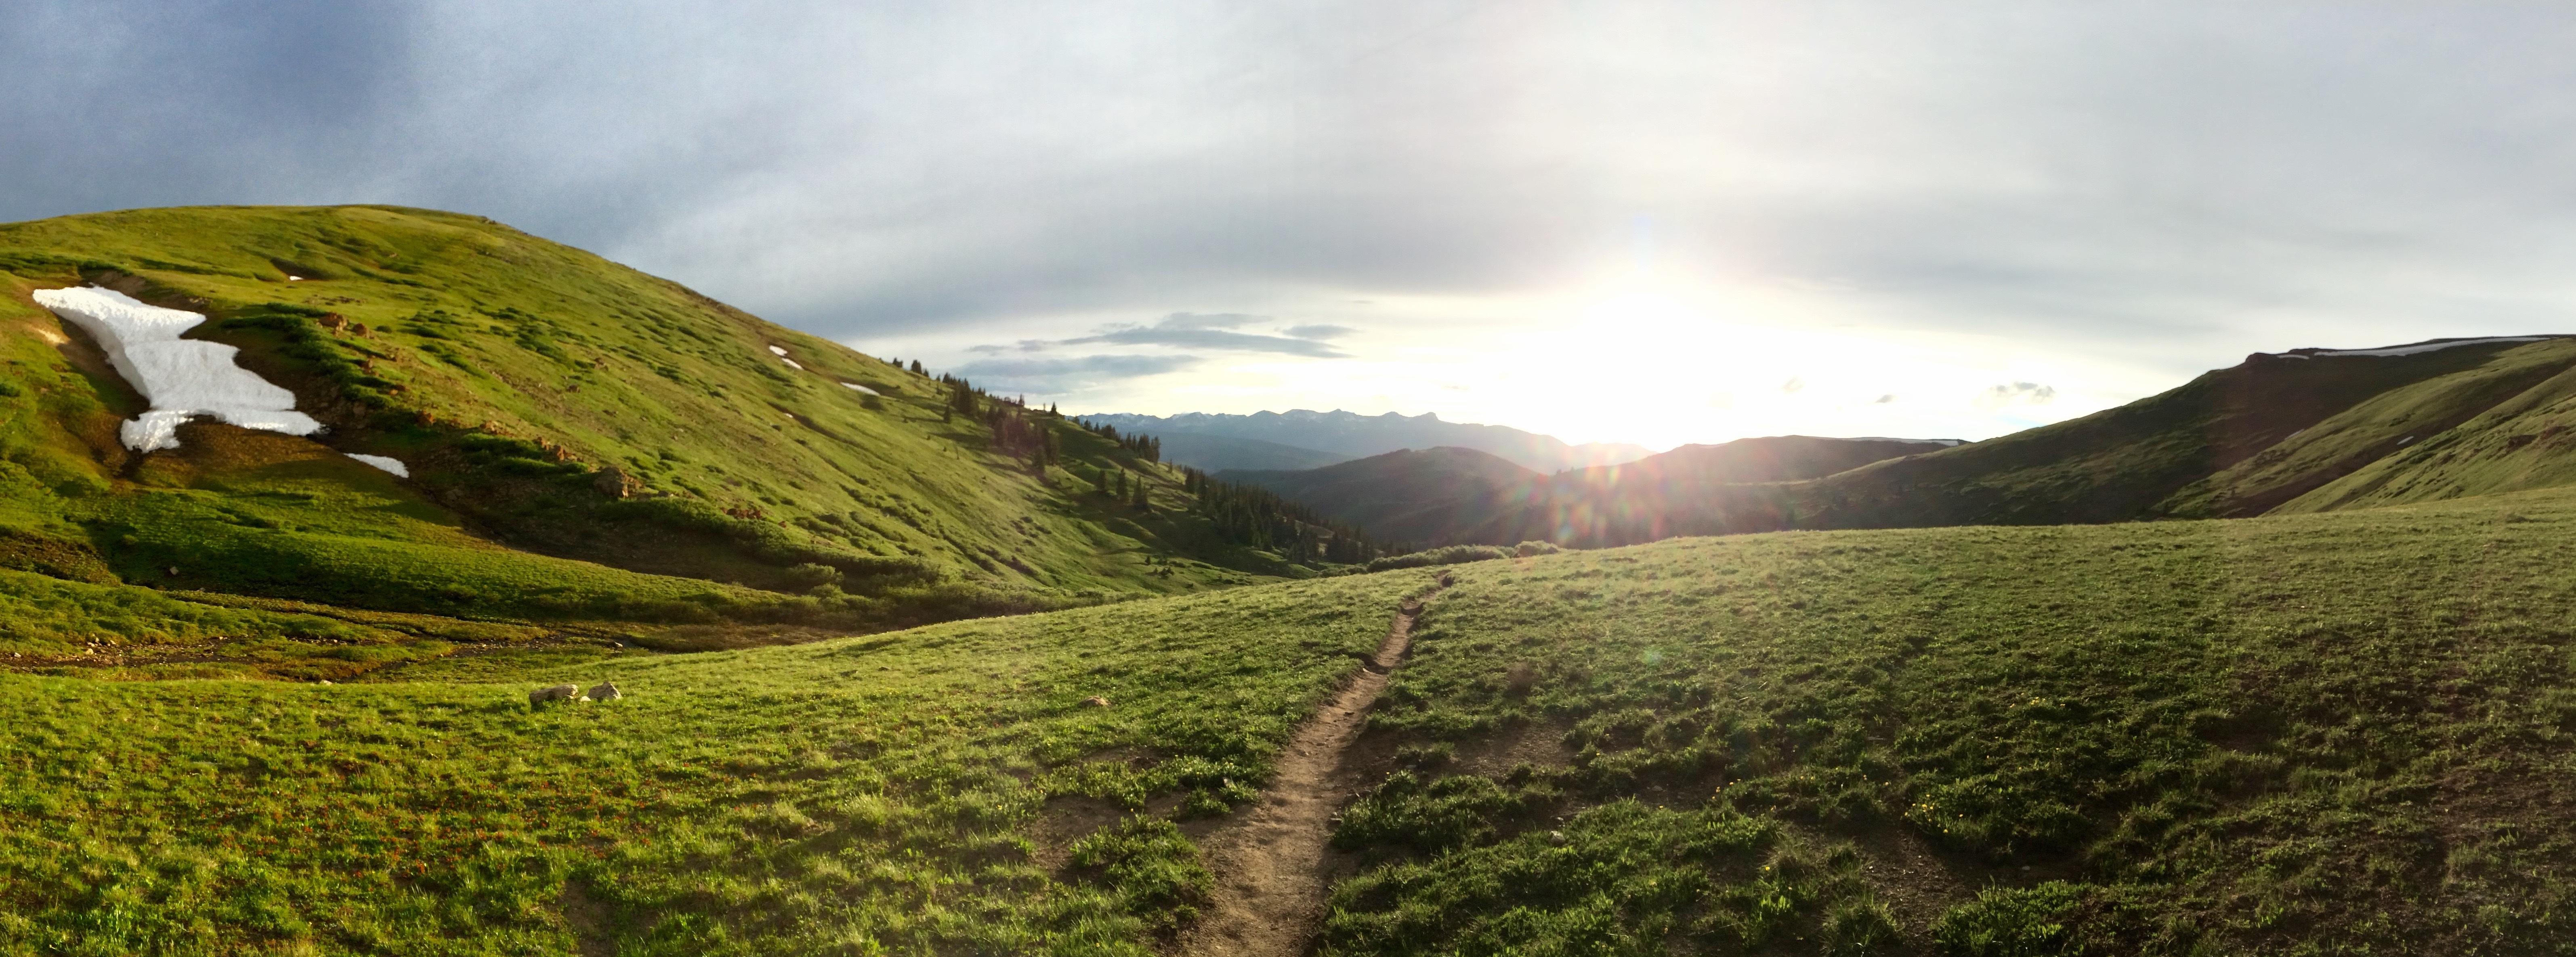 mountain path with sun